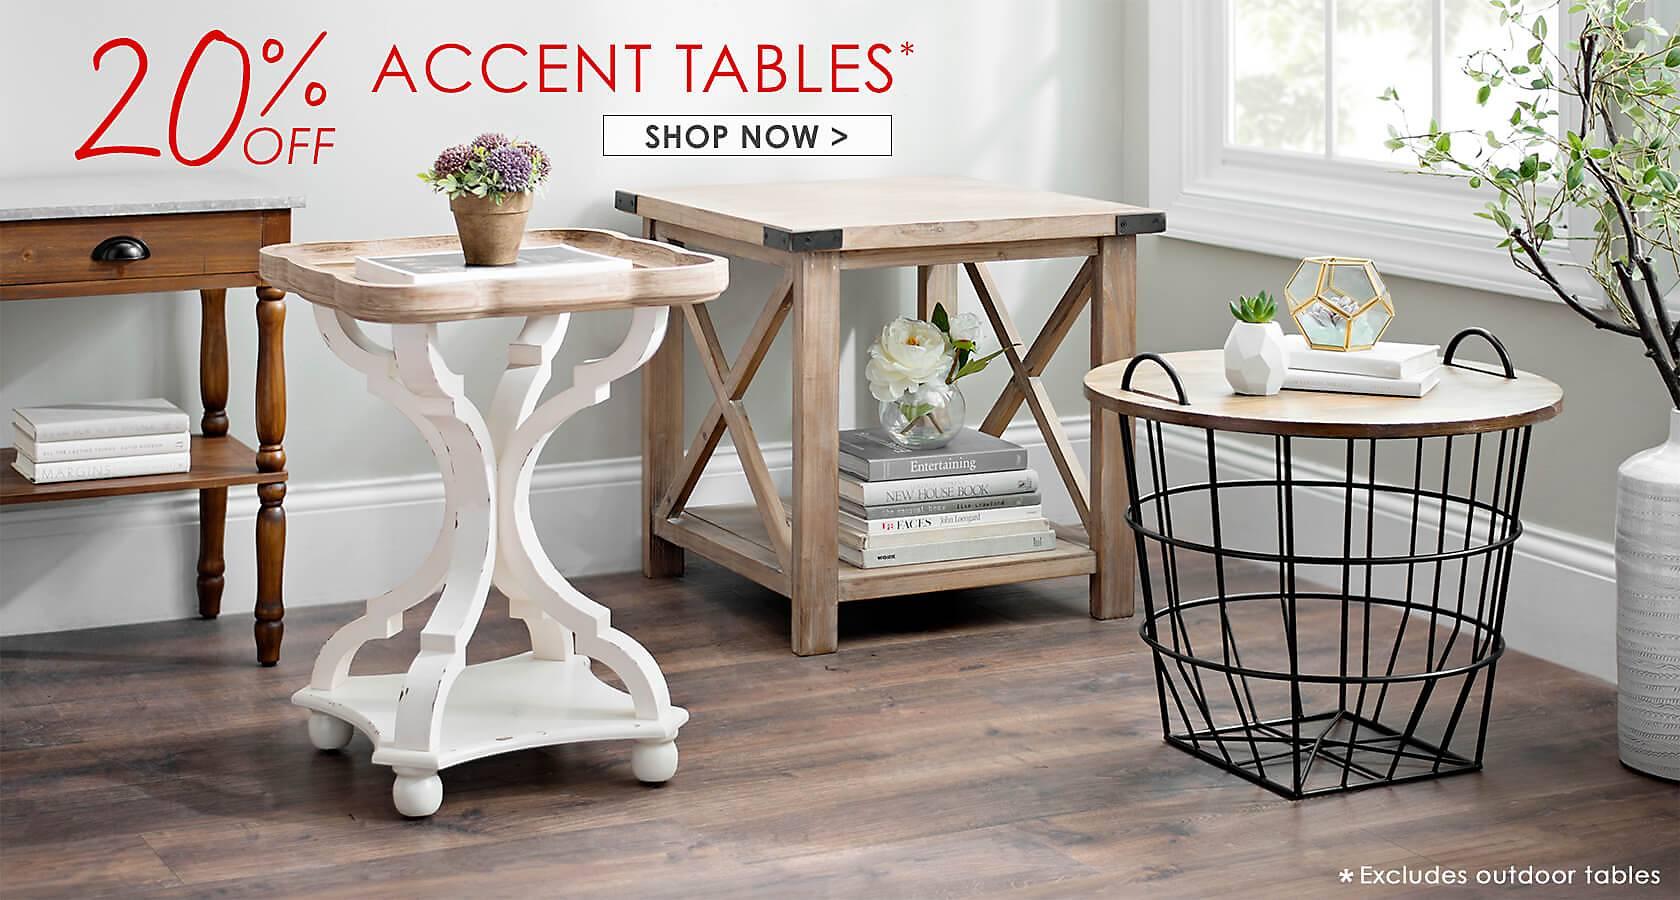 20% Off Accent Tables - Shop Now